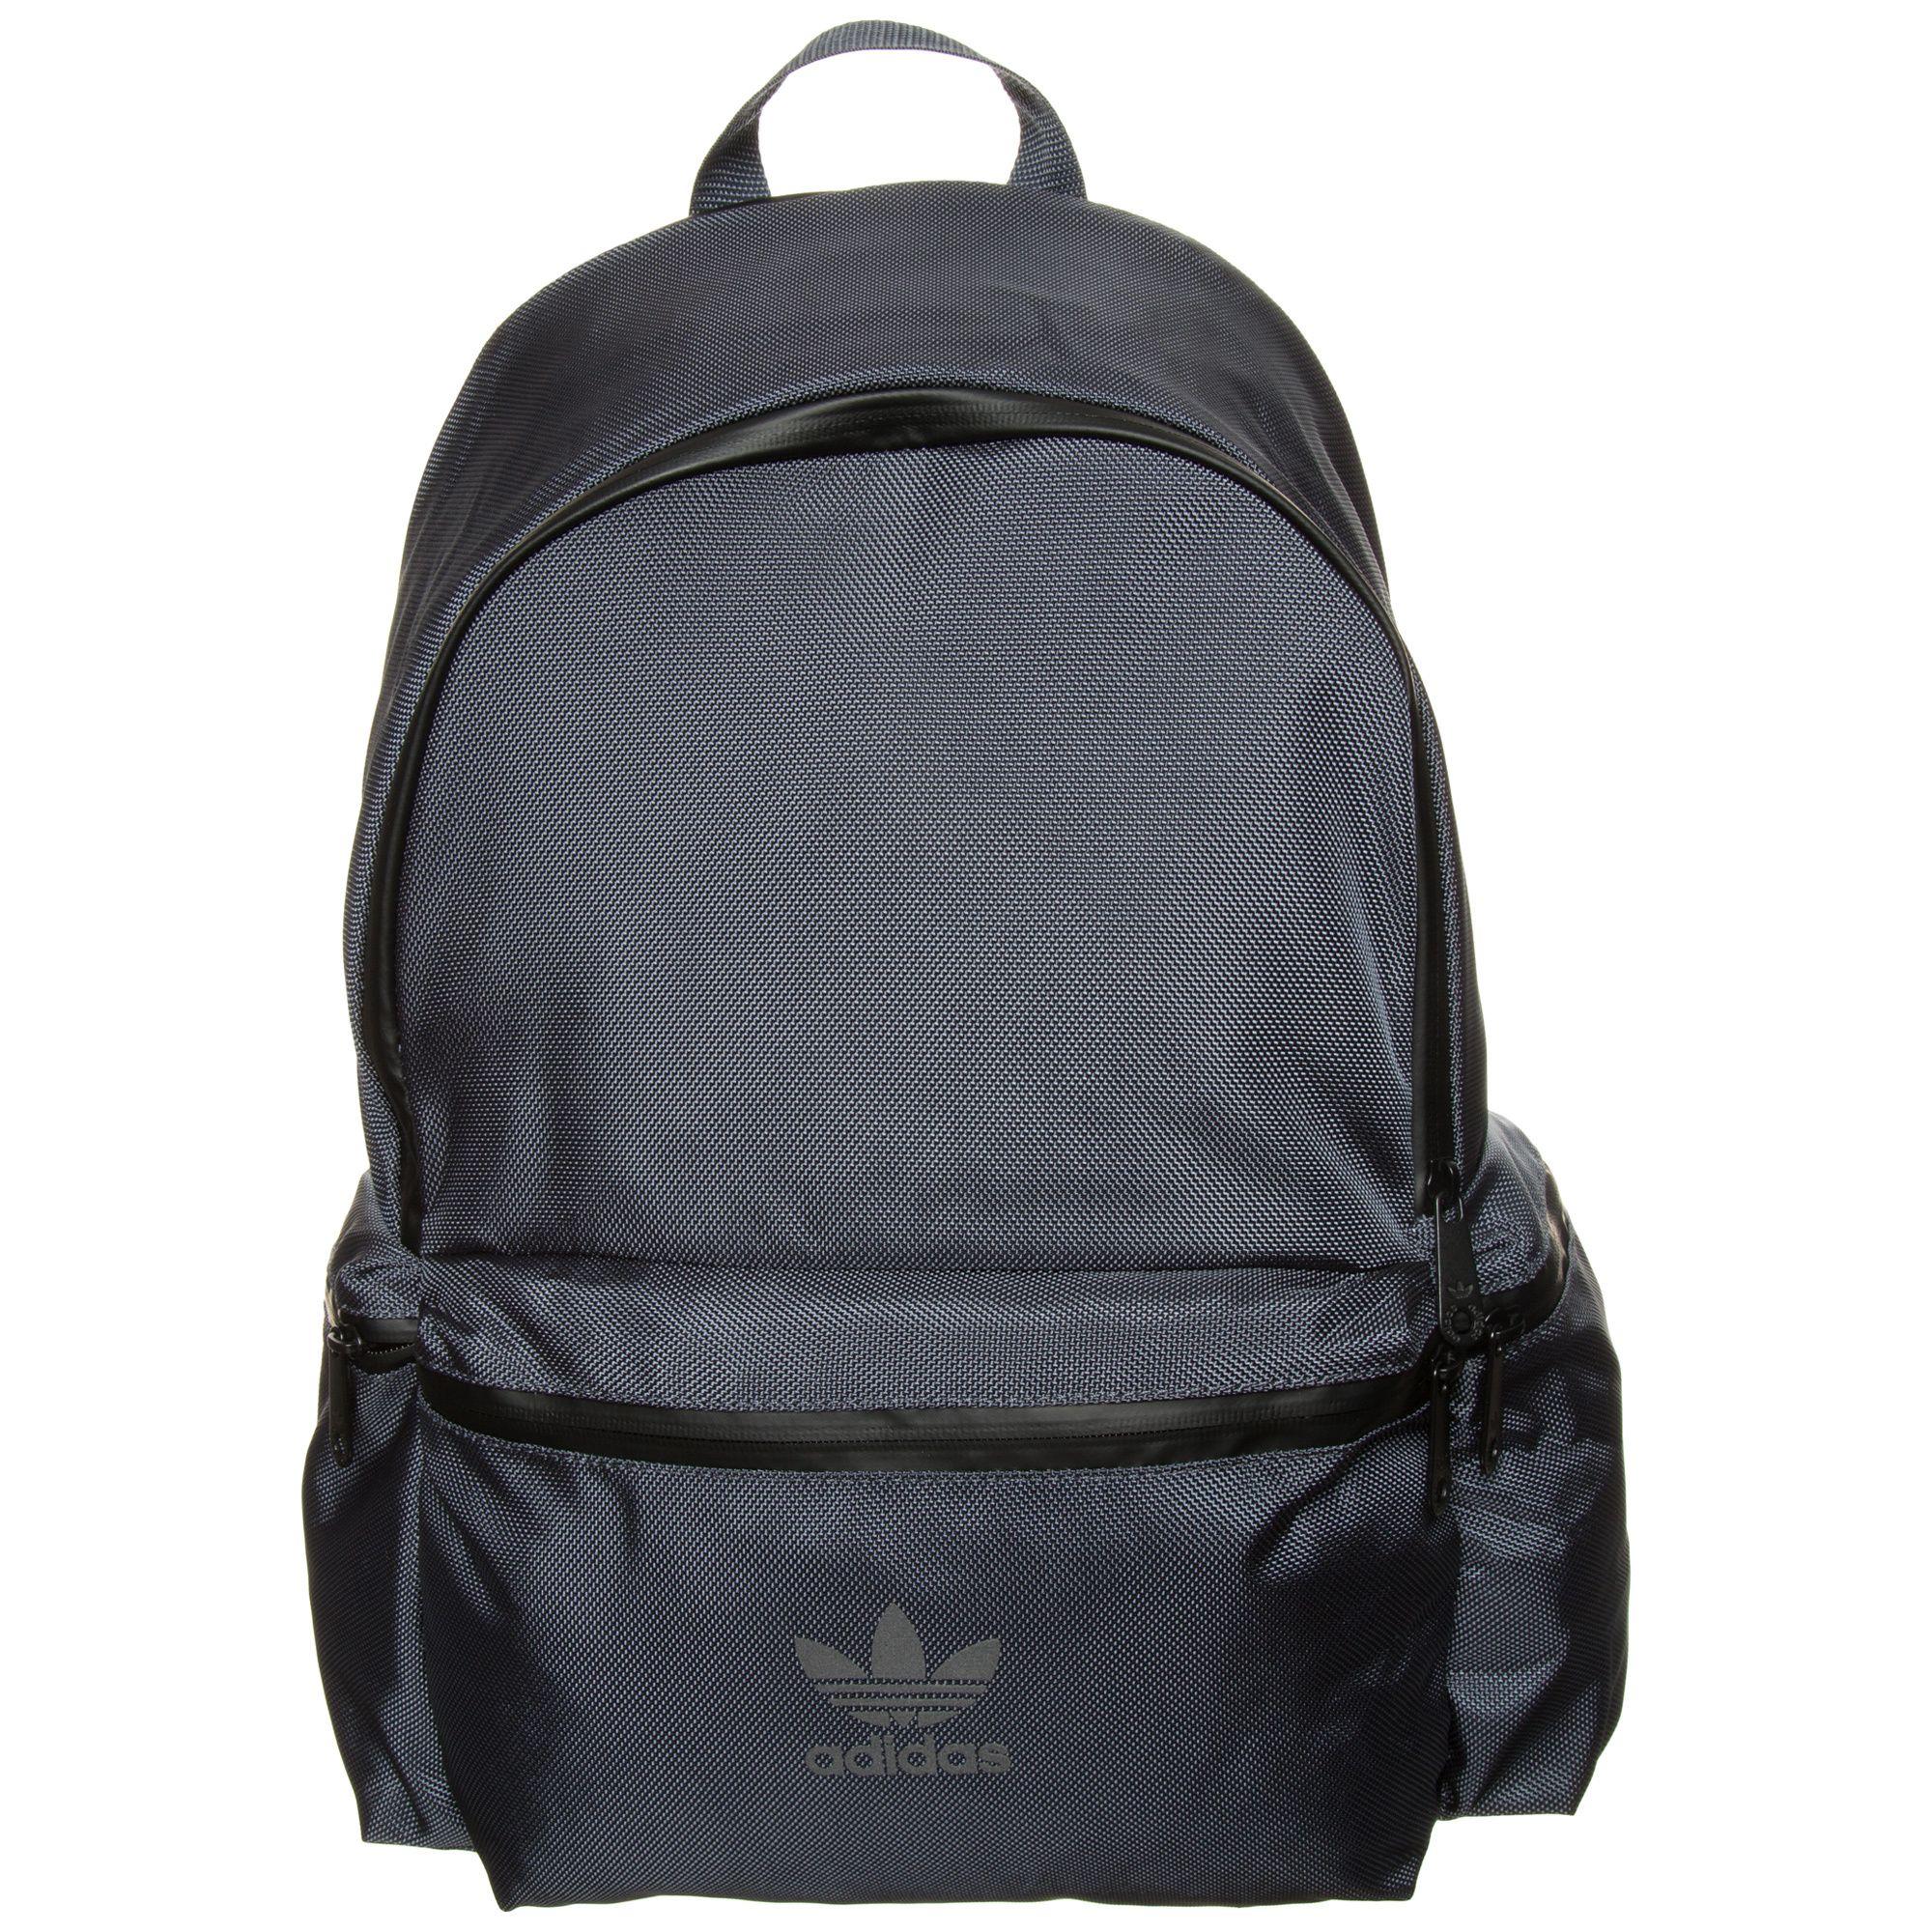 ADIDAS ORIGINALS adidas Originals Three Pocket Rucksack